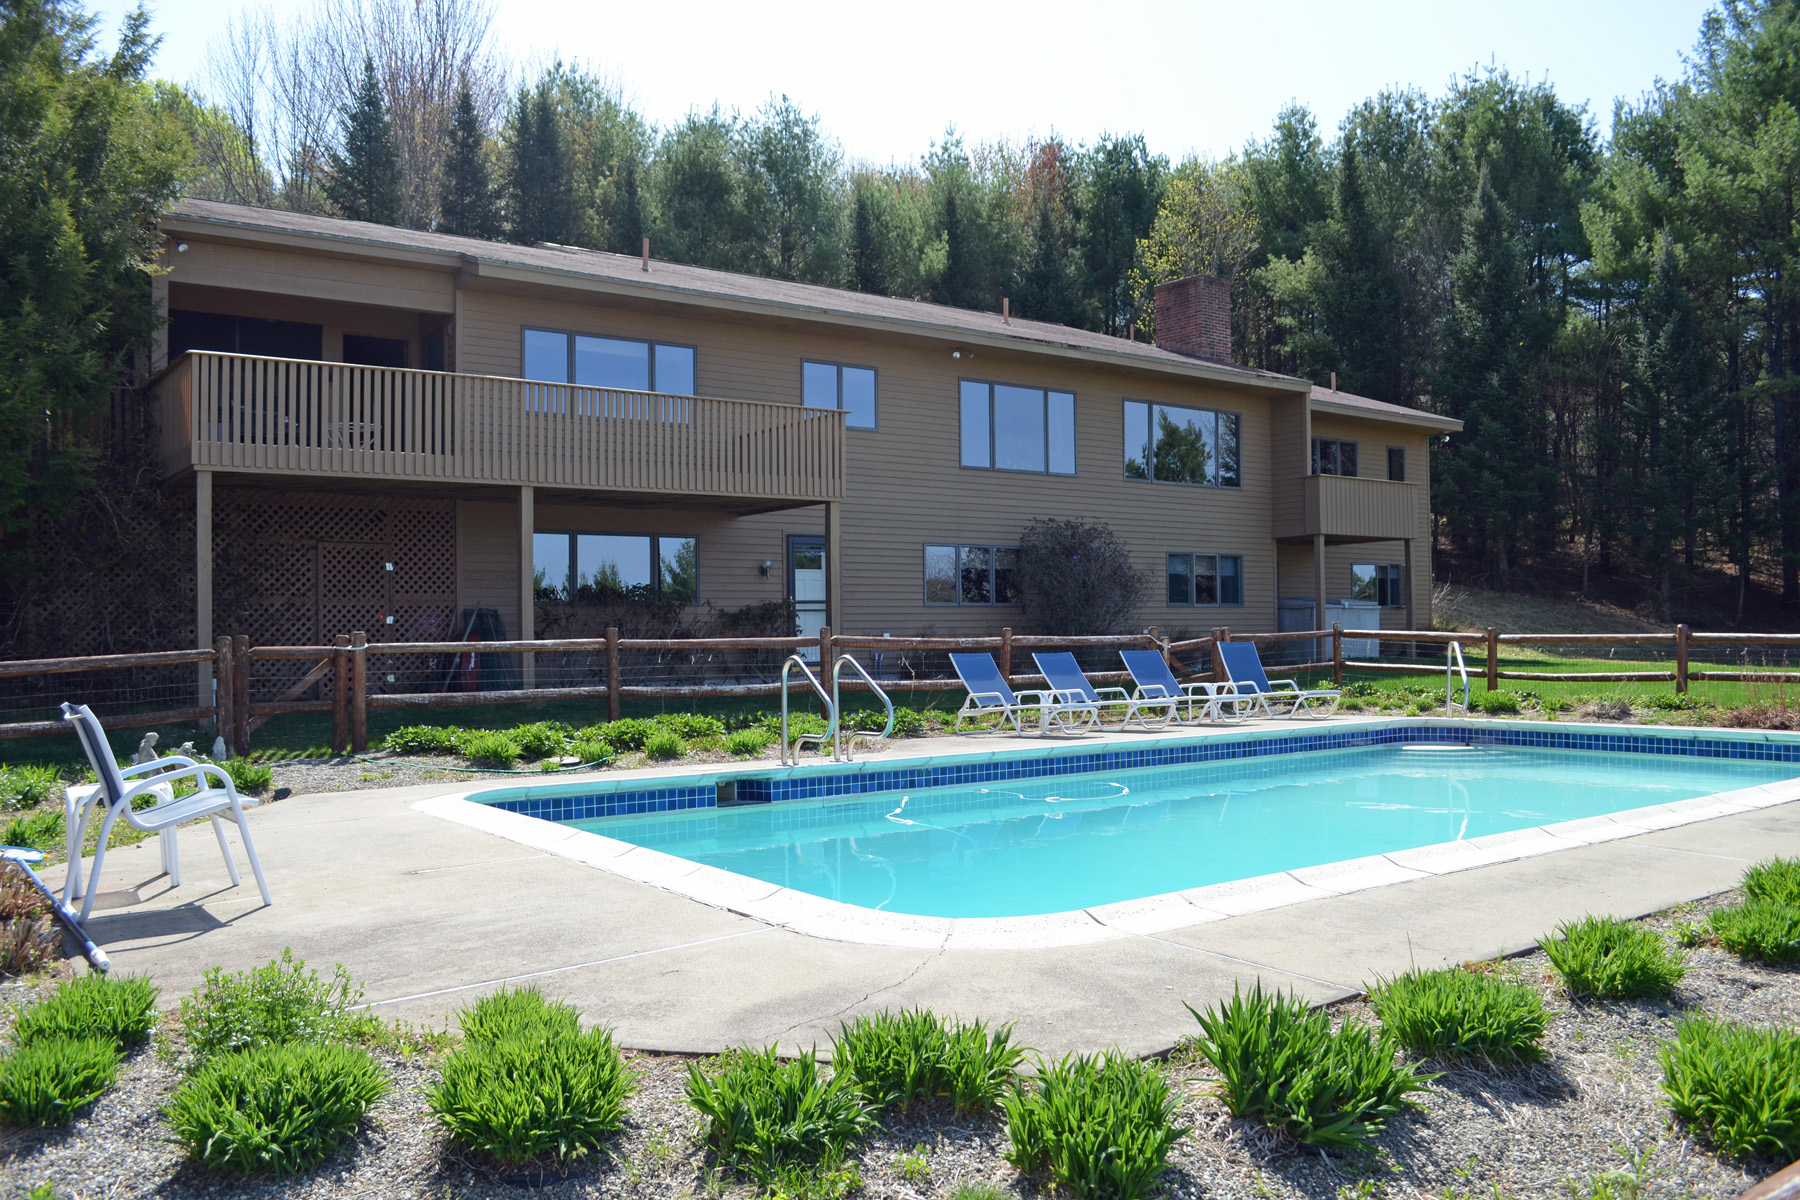 Single Family Home for Sale at 35 Stevens Road, Hanover 35 Stevens Rd Hanover, New Hampshire, 03755 United States